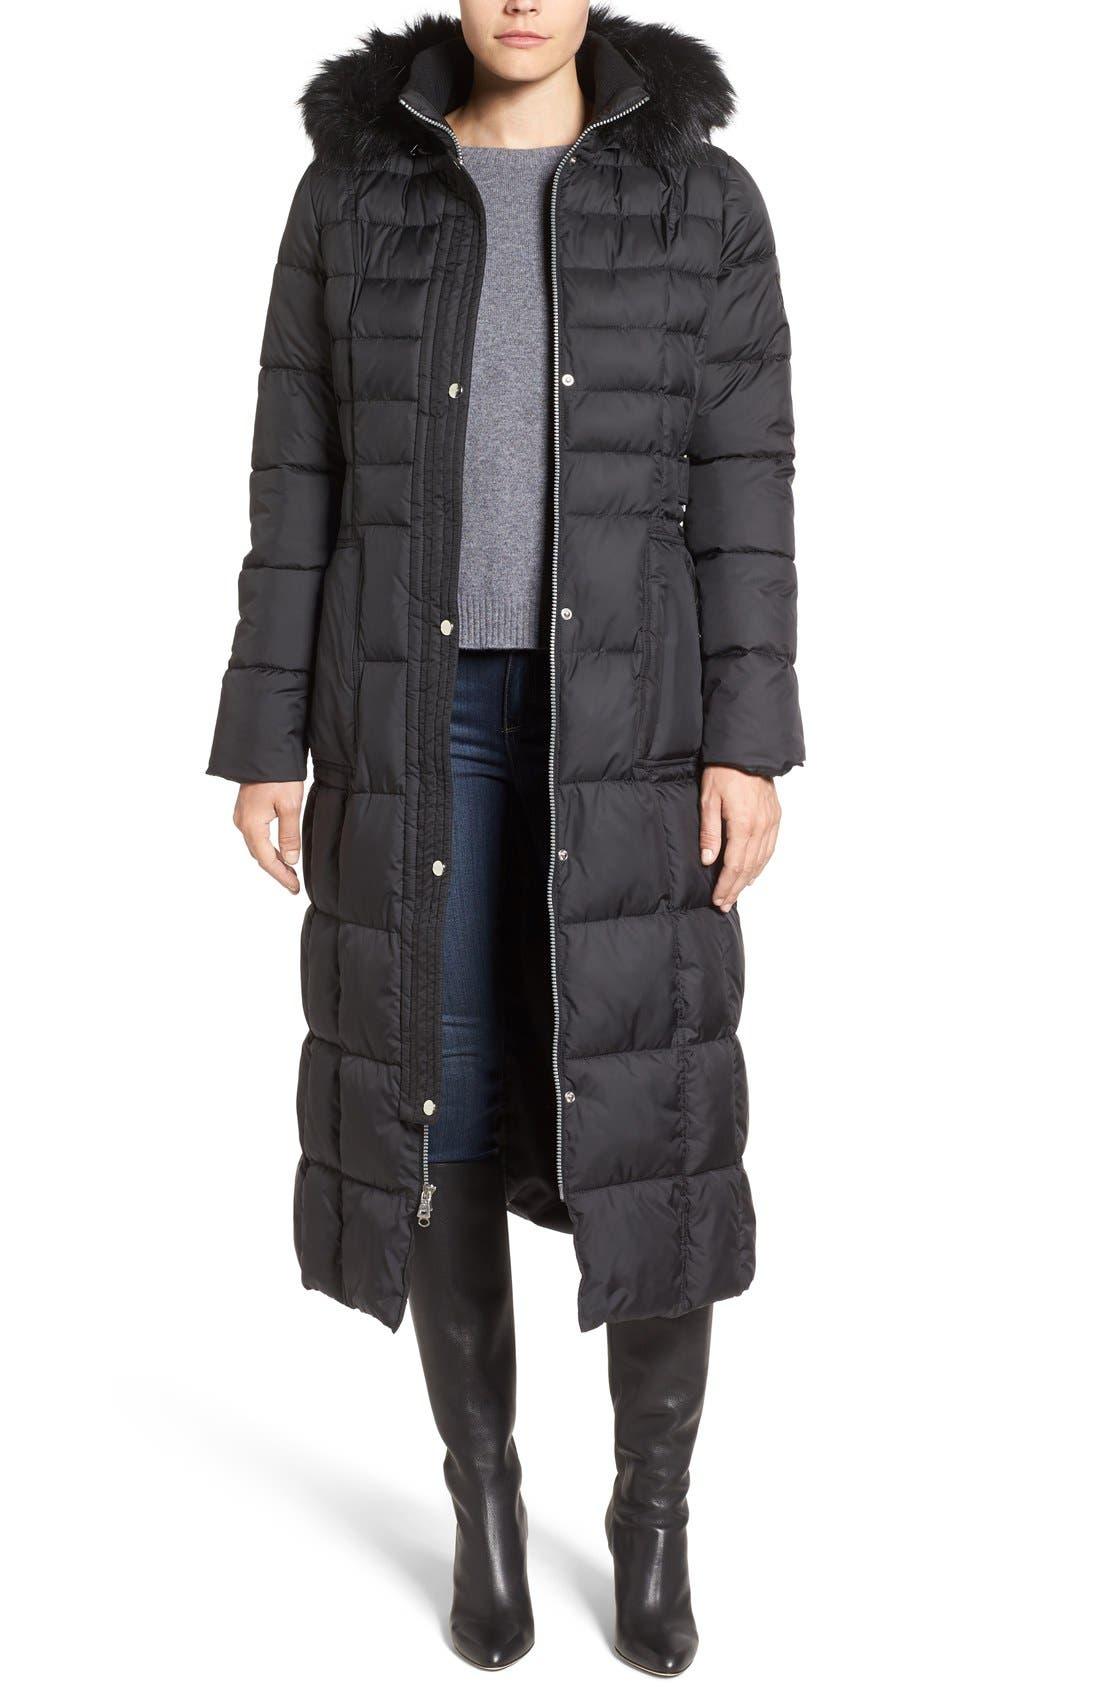 Larry Levine Quilted Maxi Coat with Faux Fur Trim